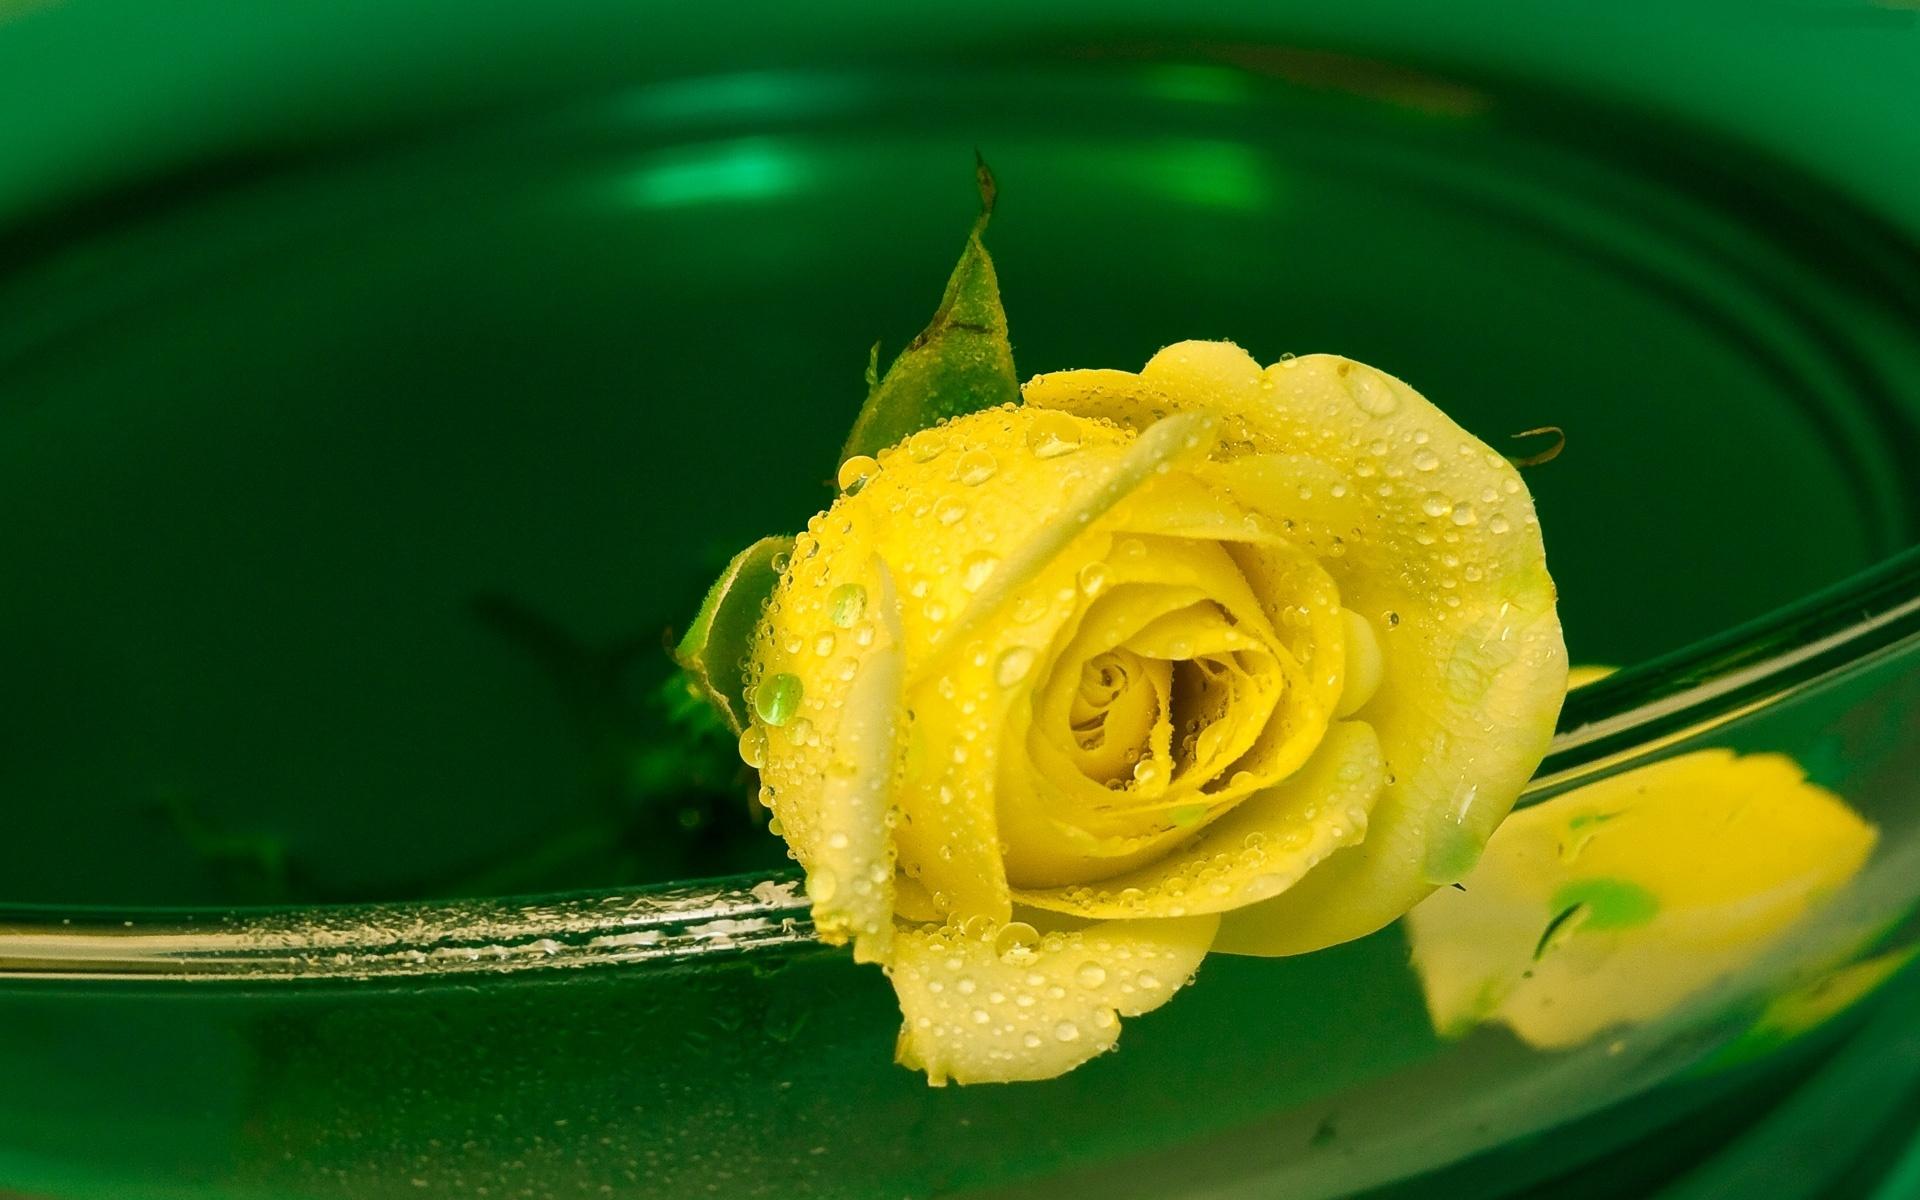 Hd wallpaper yellow rose - Yellow Rose Wallpapers